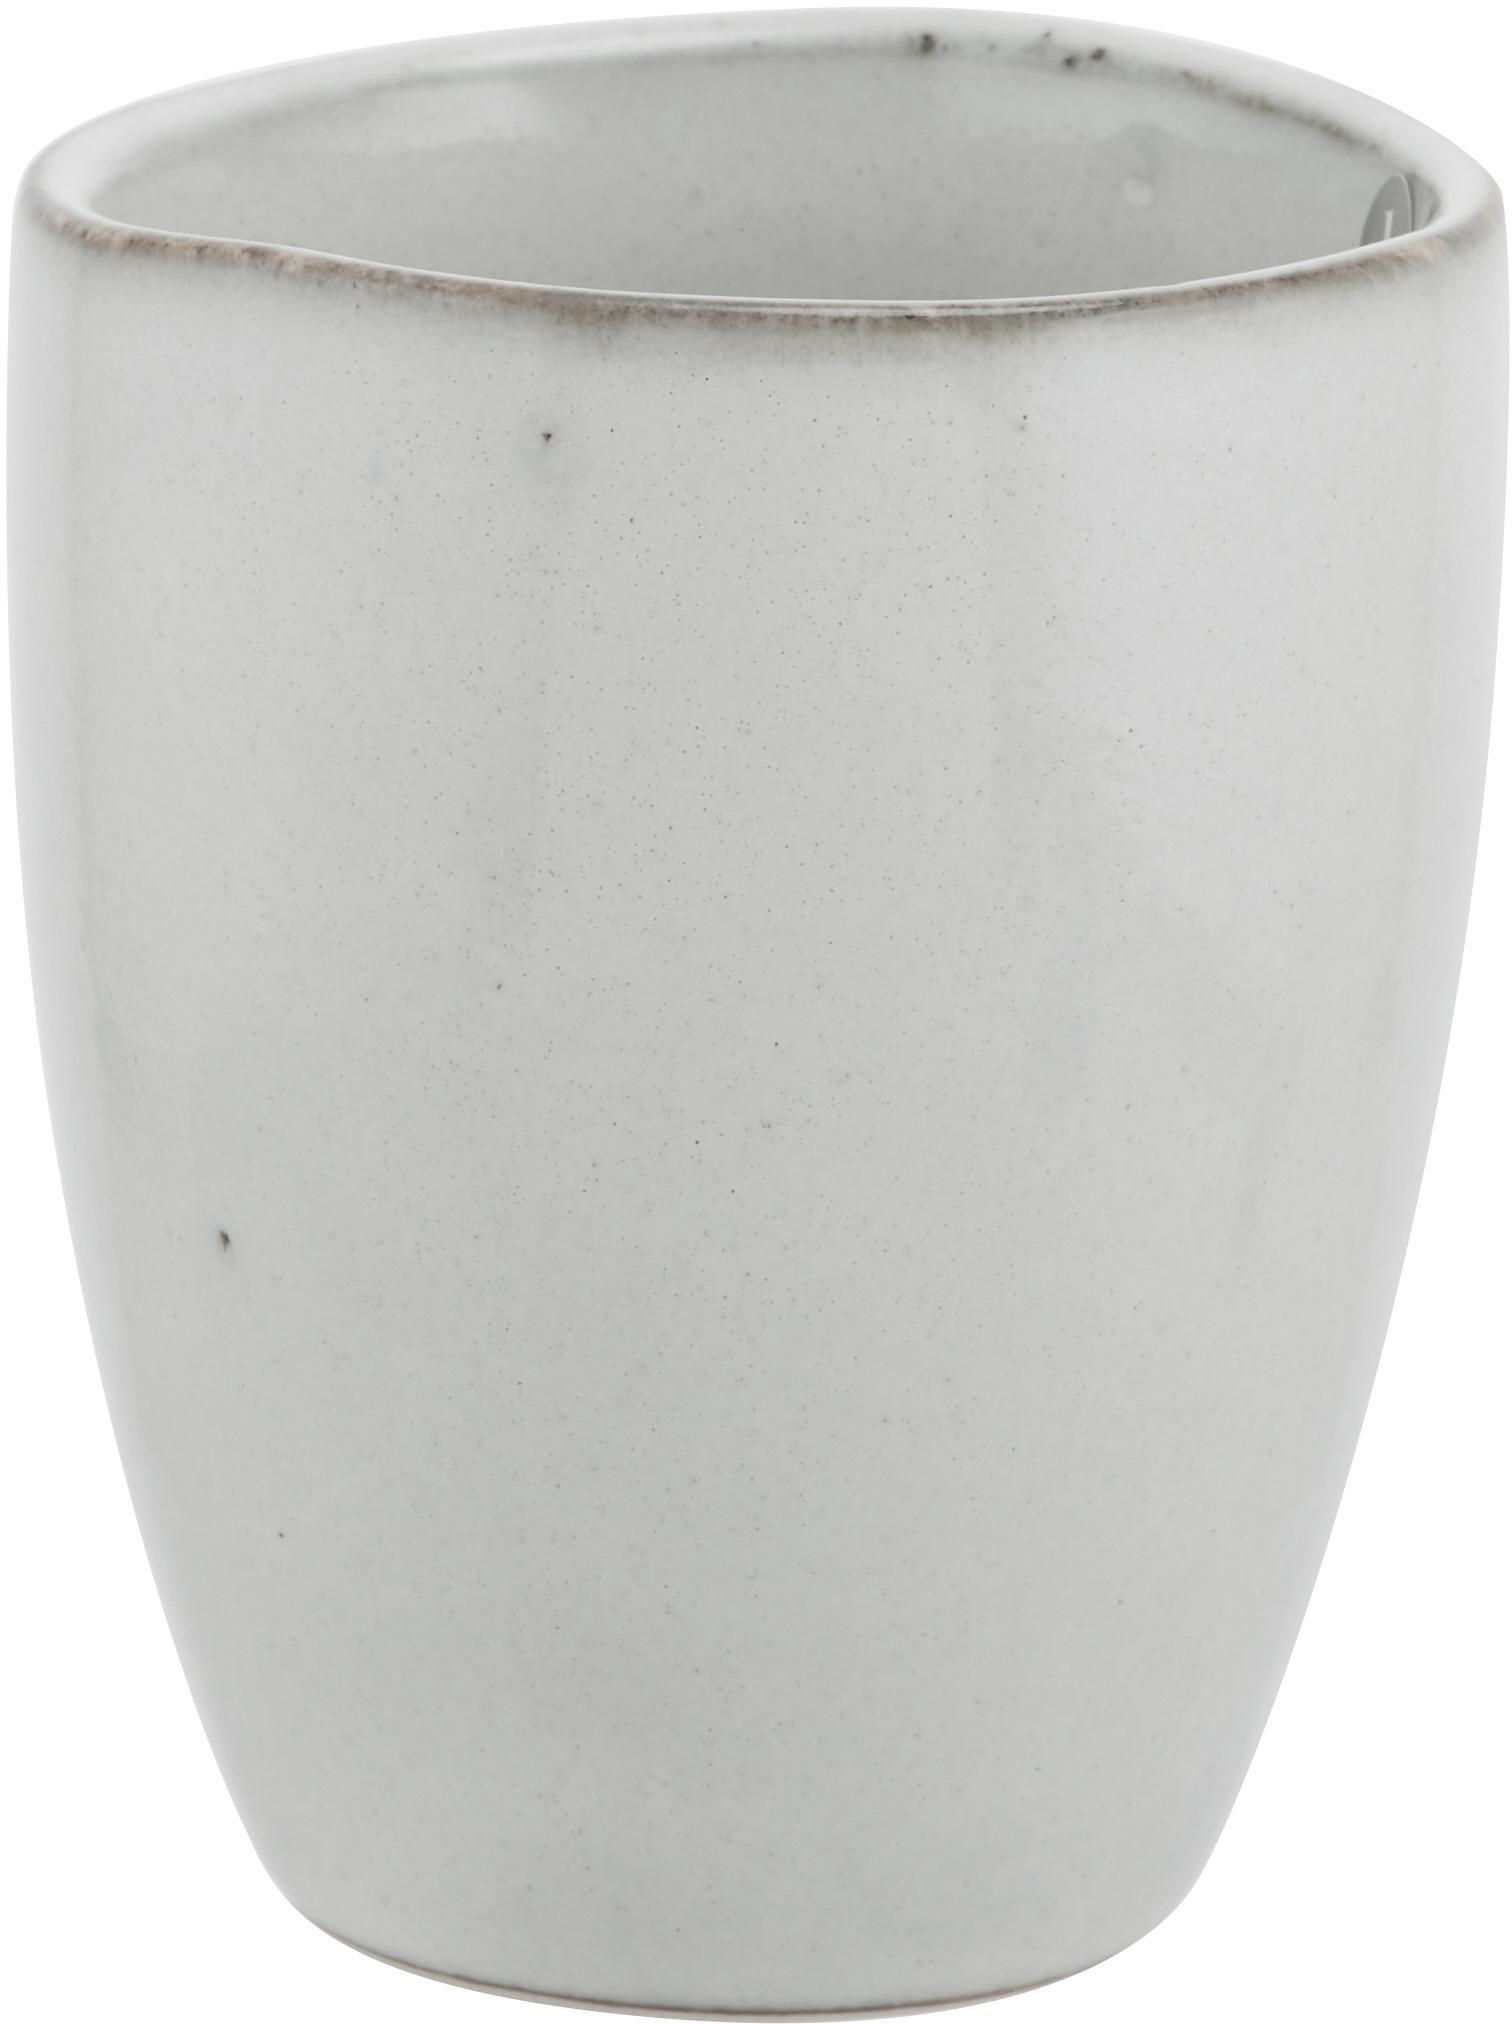 Handgemaakte bekers Nordic Sand, 6 stuks, Keramiek, Zandkleurig, Ø 8 x H 10 cm